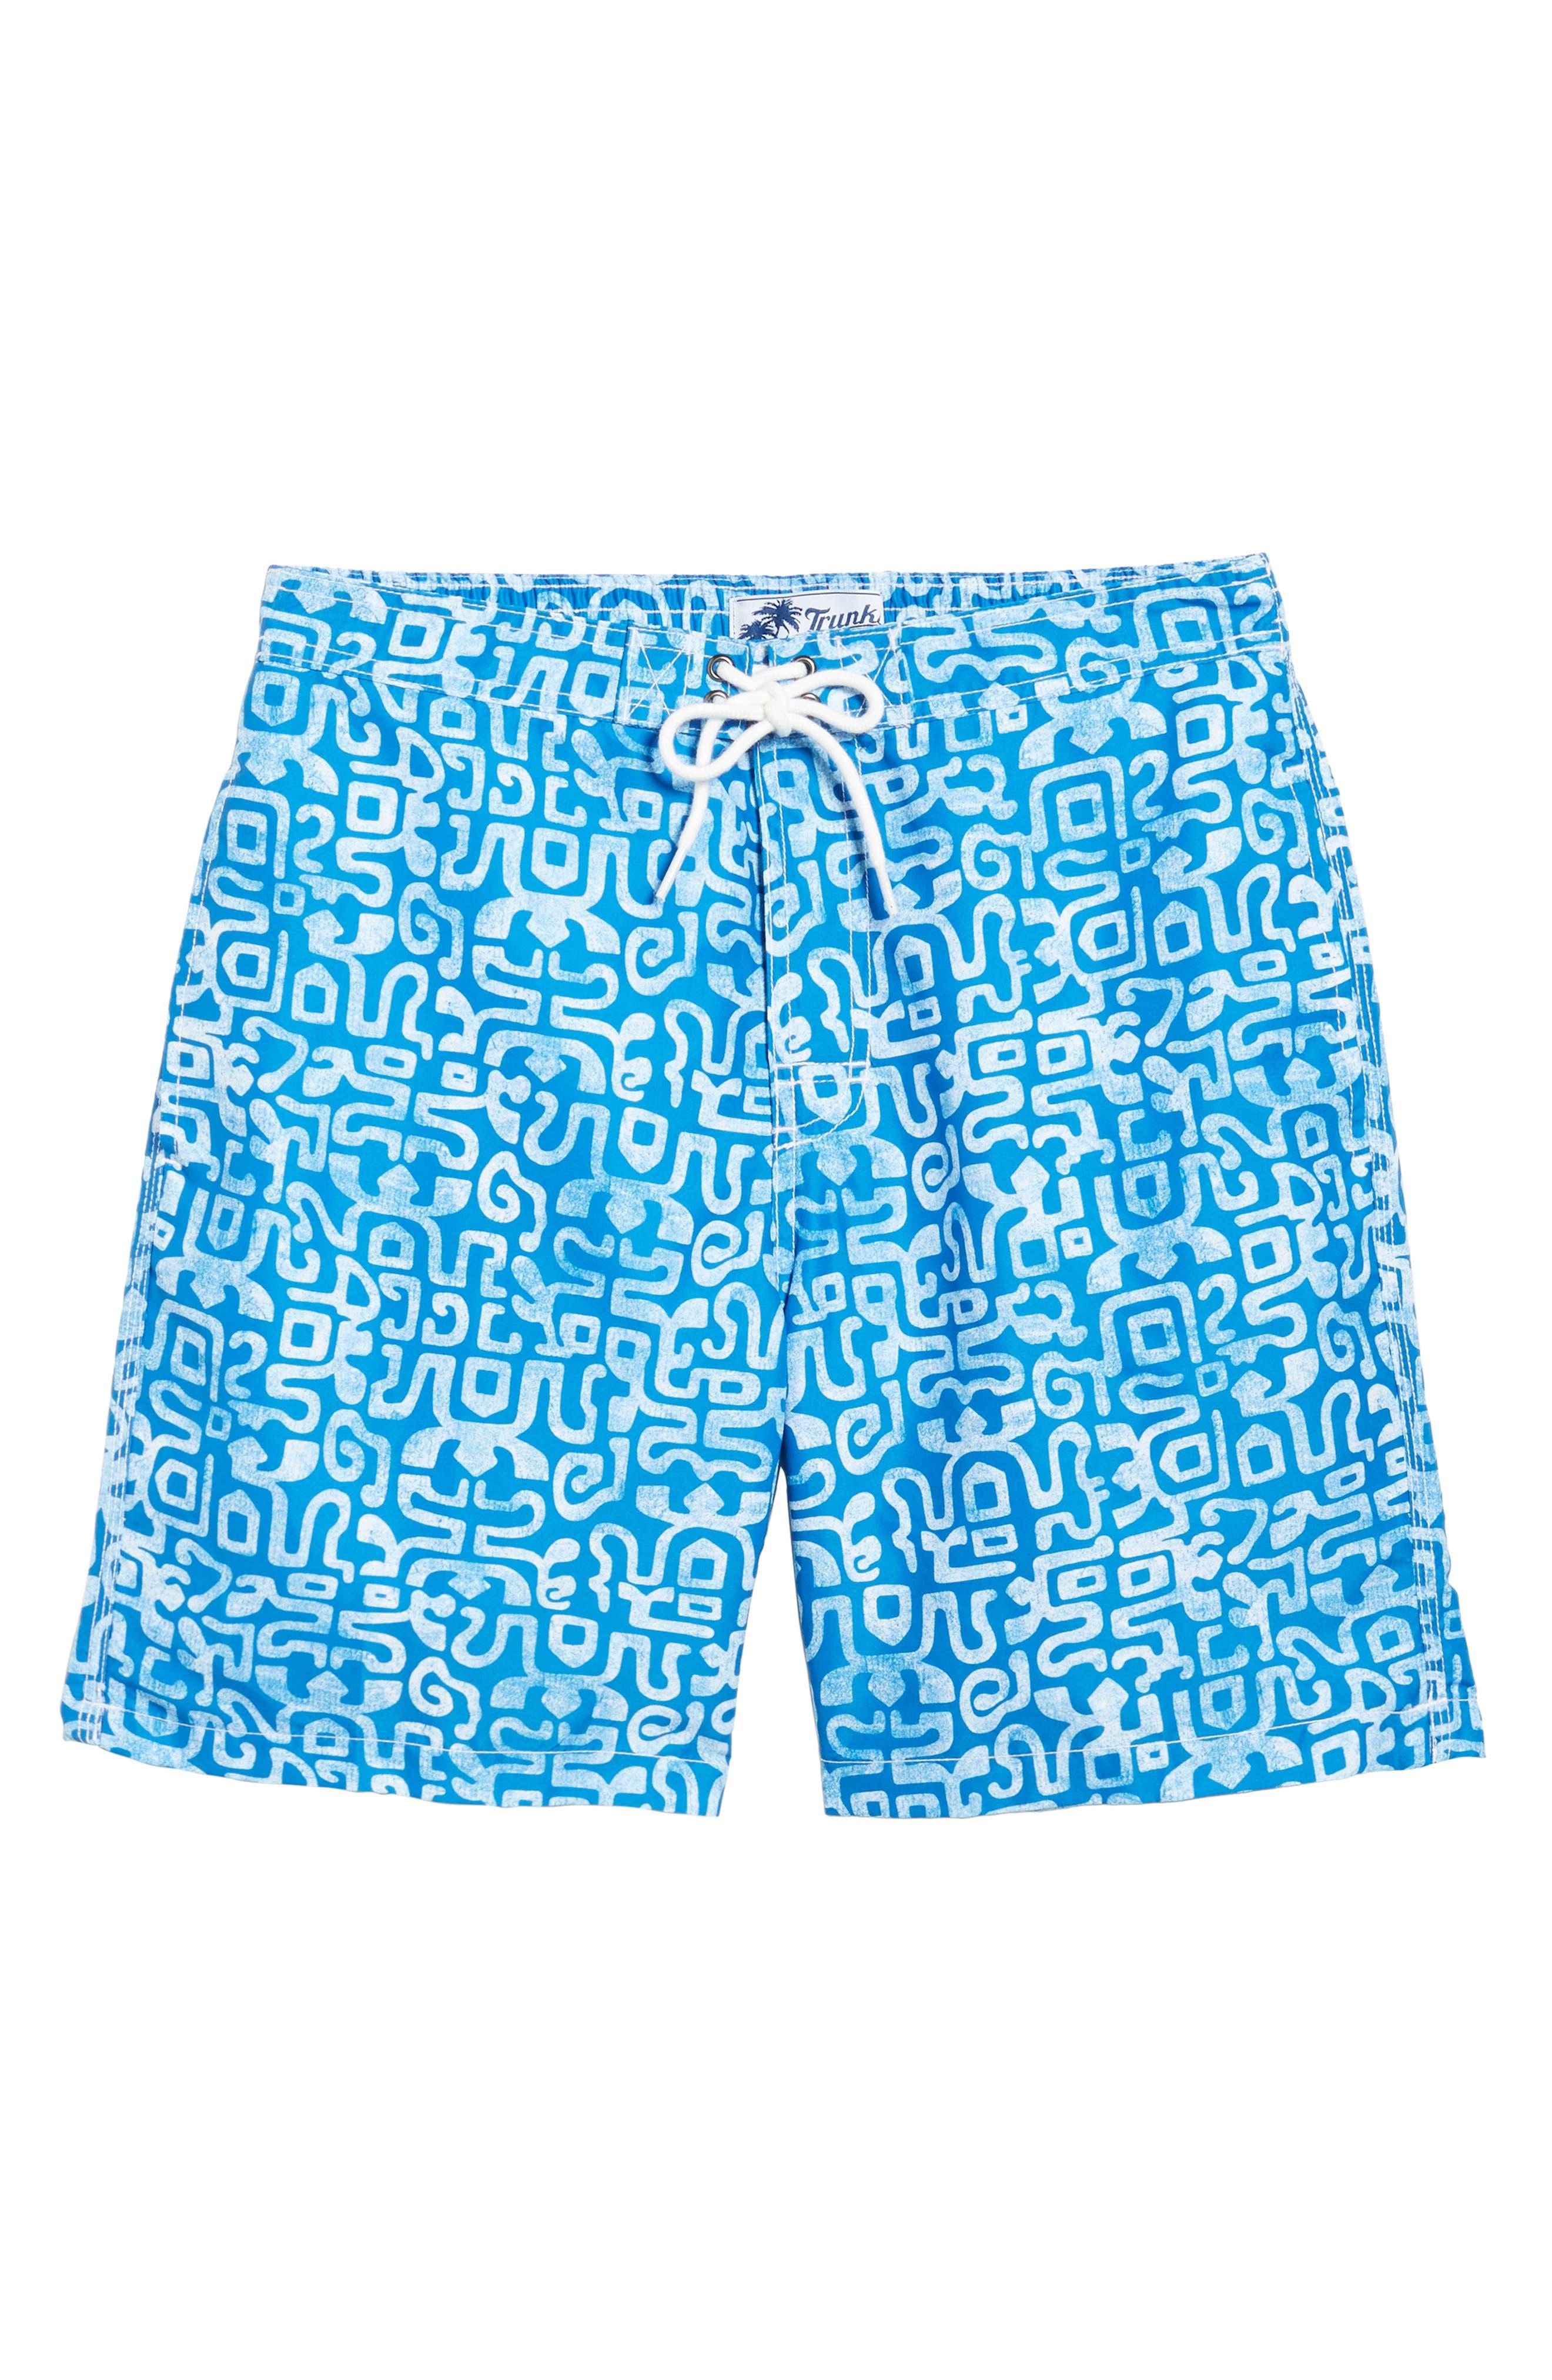 Trunks Swim & Surf CO. Swami Geo Print Board Shorts,                             Alternate thumbnail 6, color,                             Nautical Blue/ White